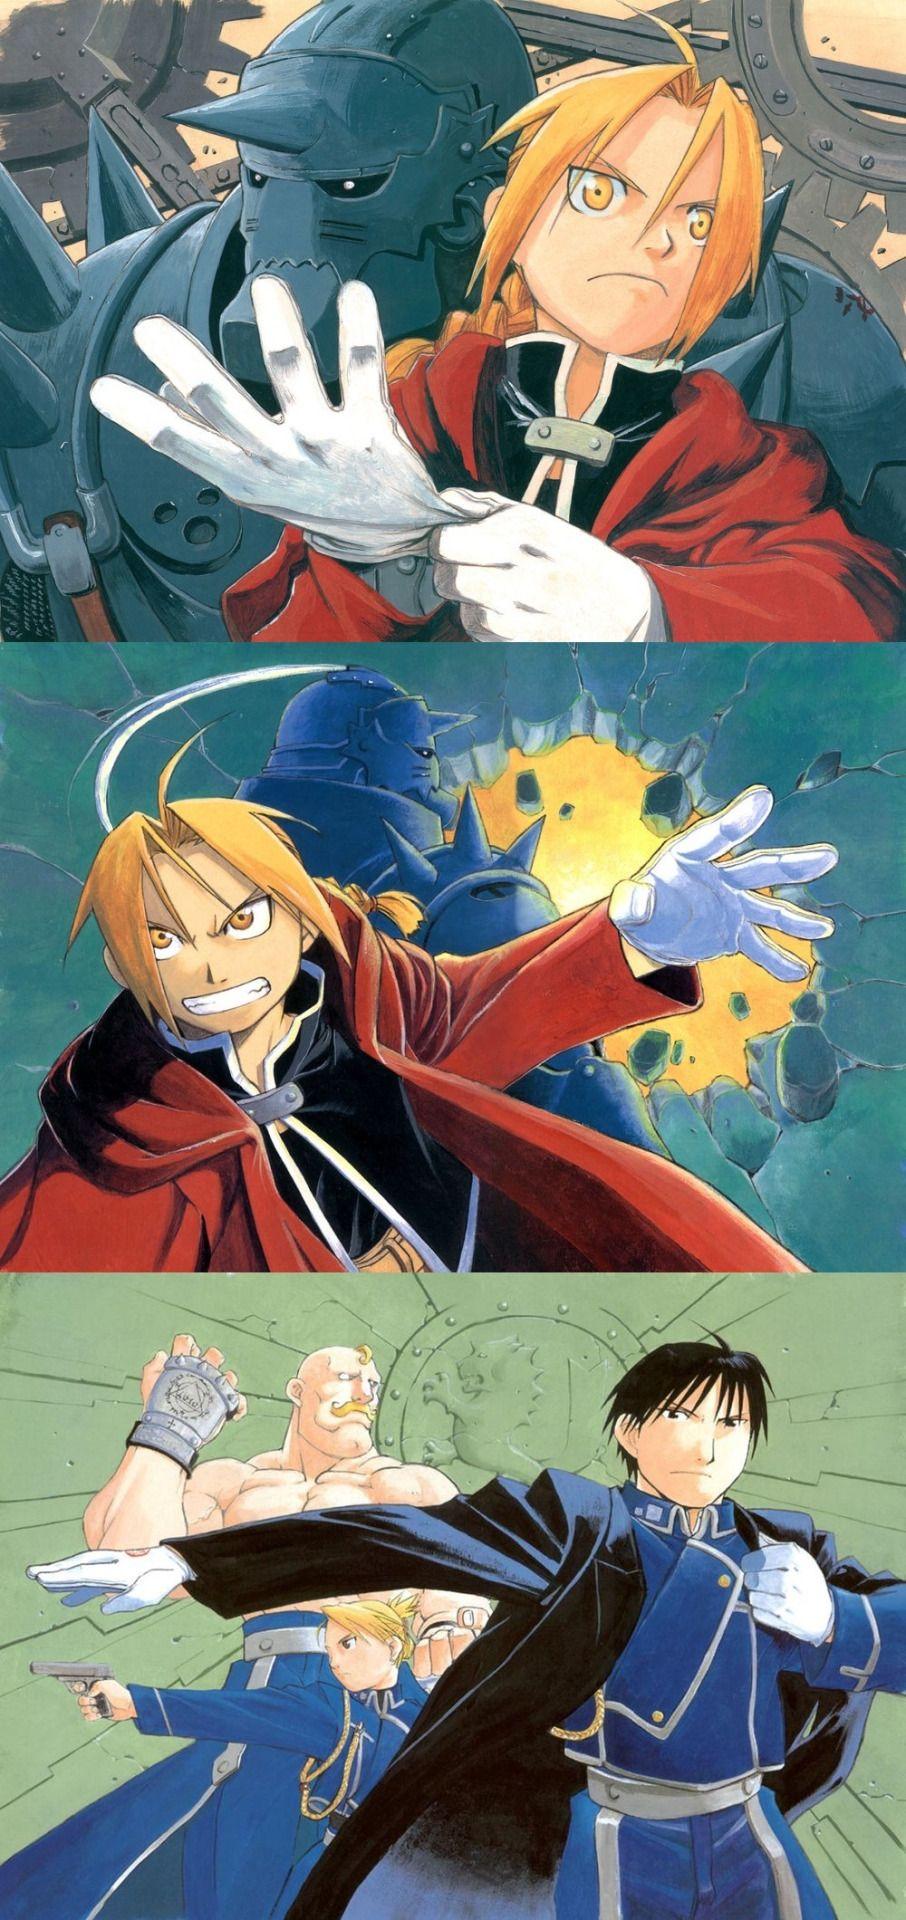 Because FMA. — reasons-to-read-fma: Fullmetal Alchemist ...